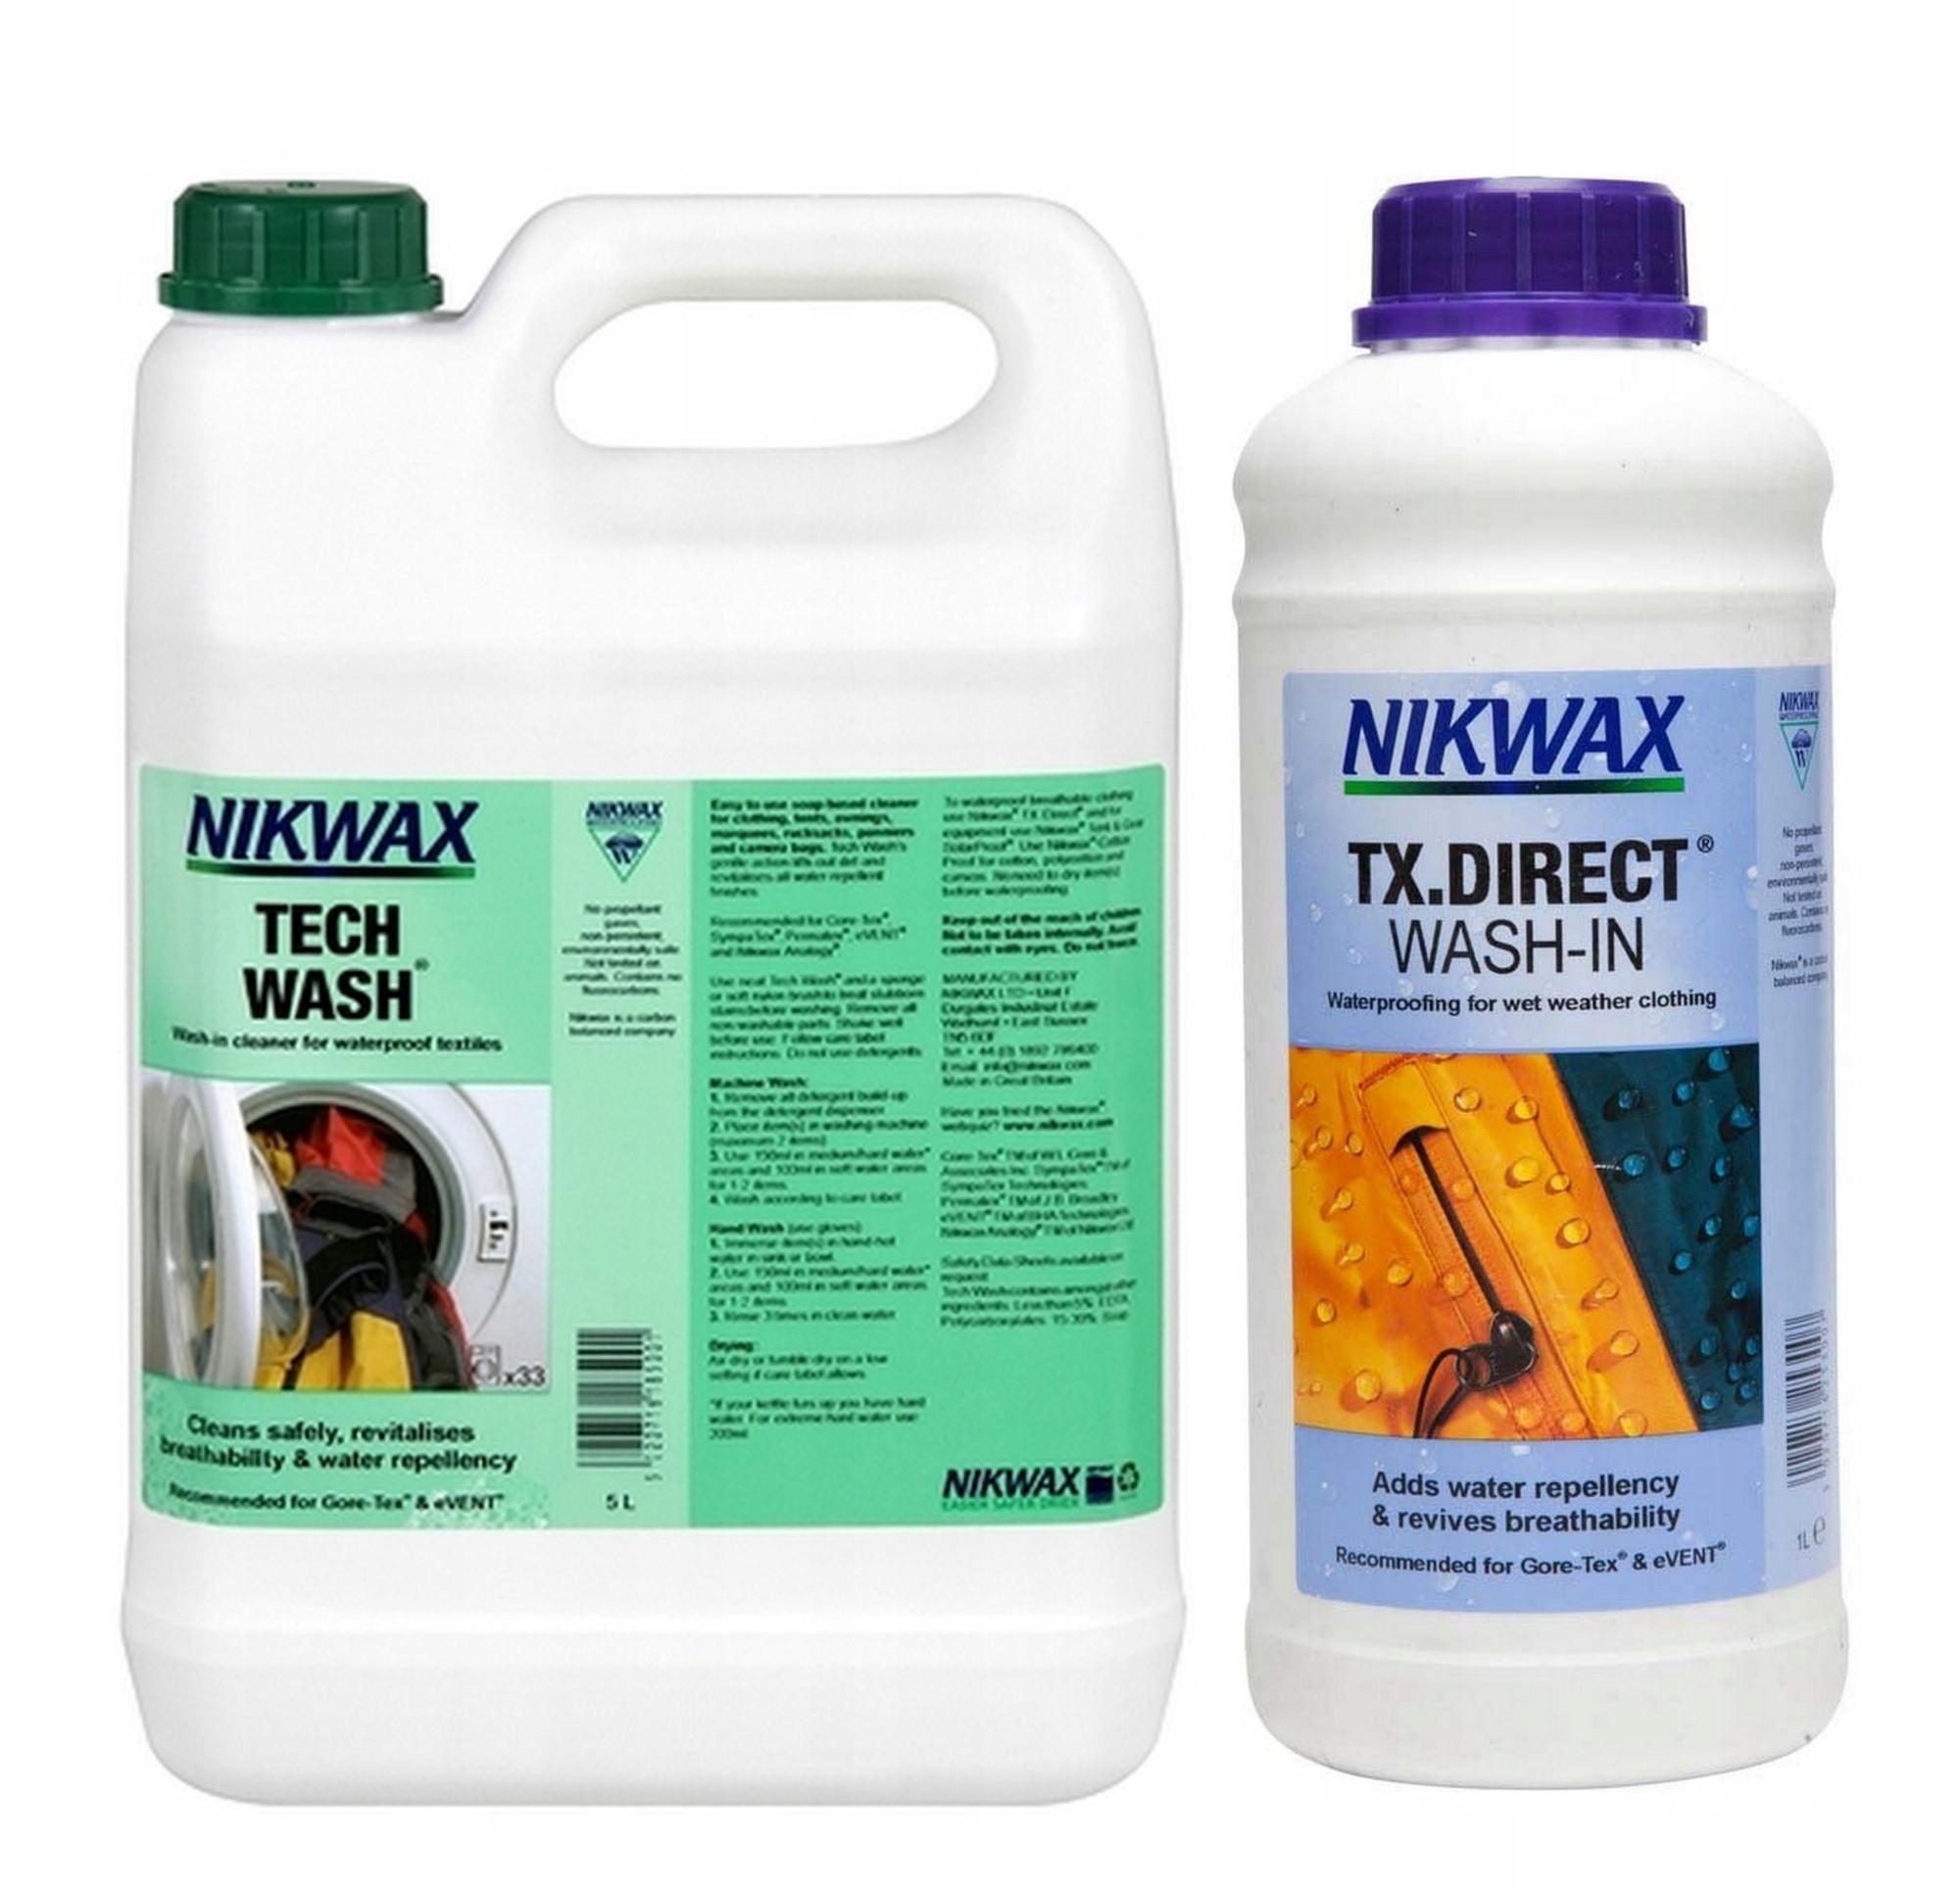 Nikwax TECH WASH-pracia Kvapalina 5 L + TX Direct 1L